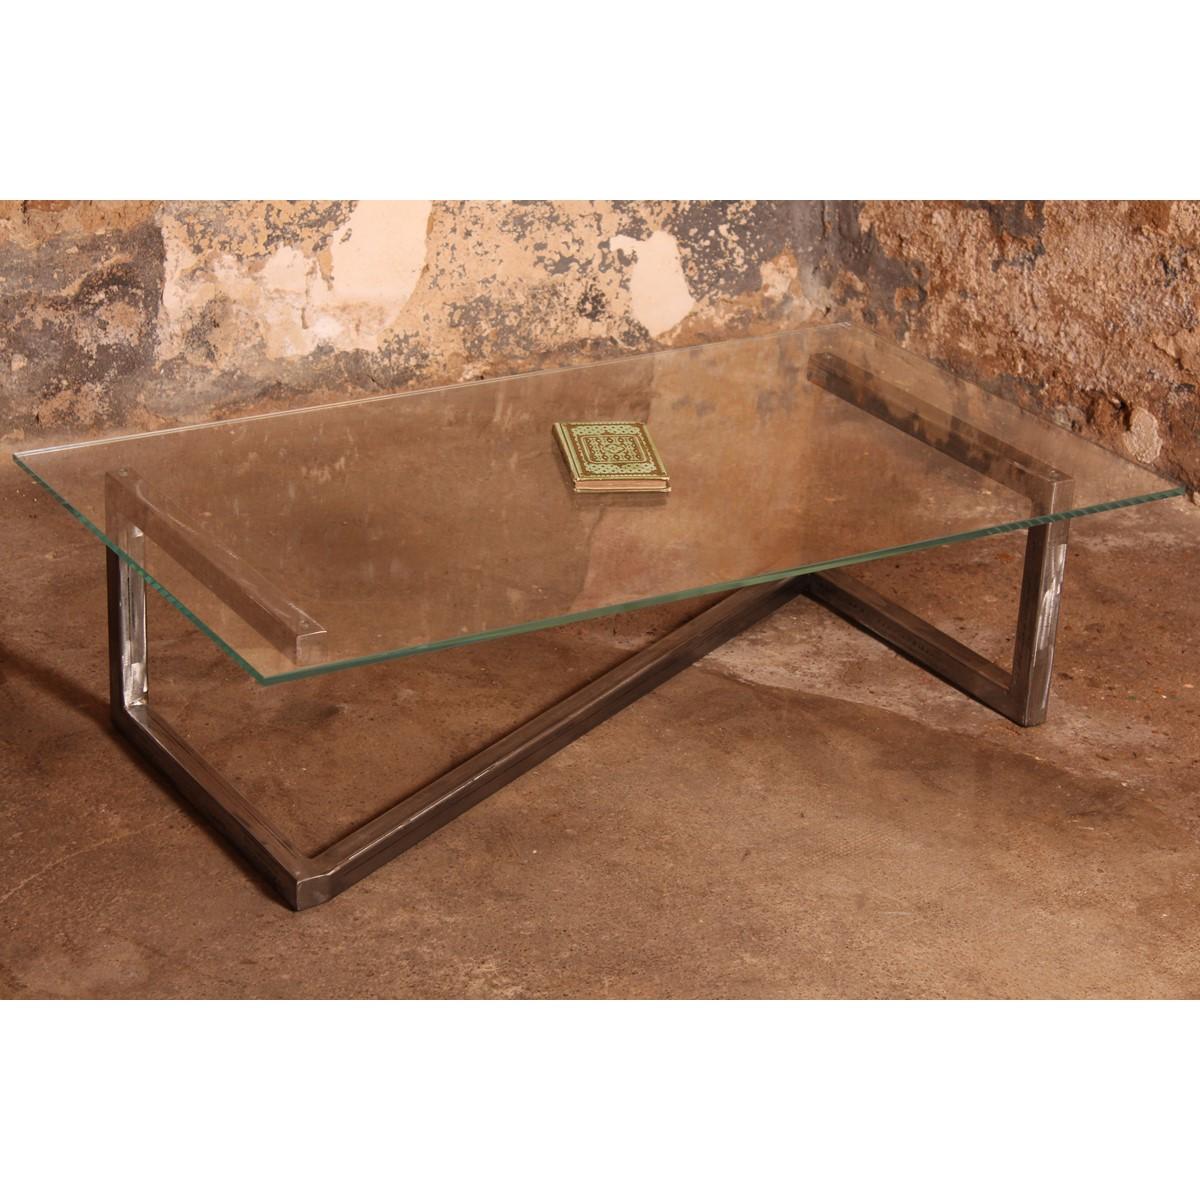 Table basse design en verre et acier barnab - Table basse design en verre ...